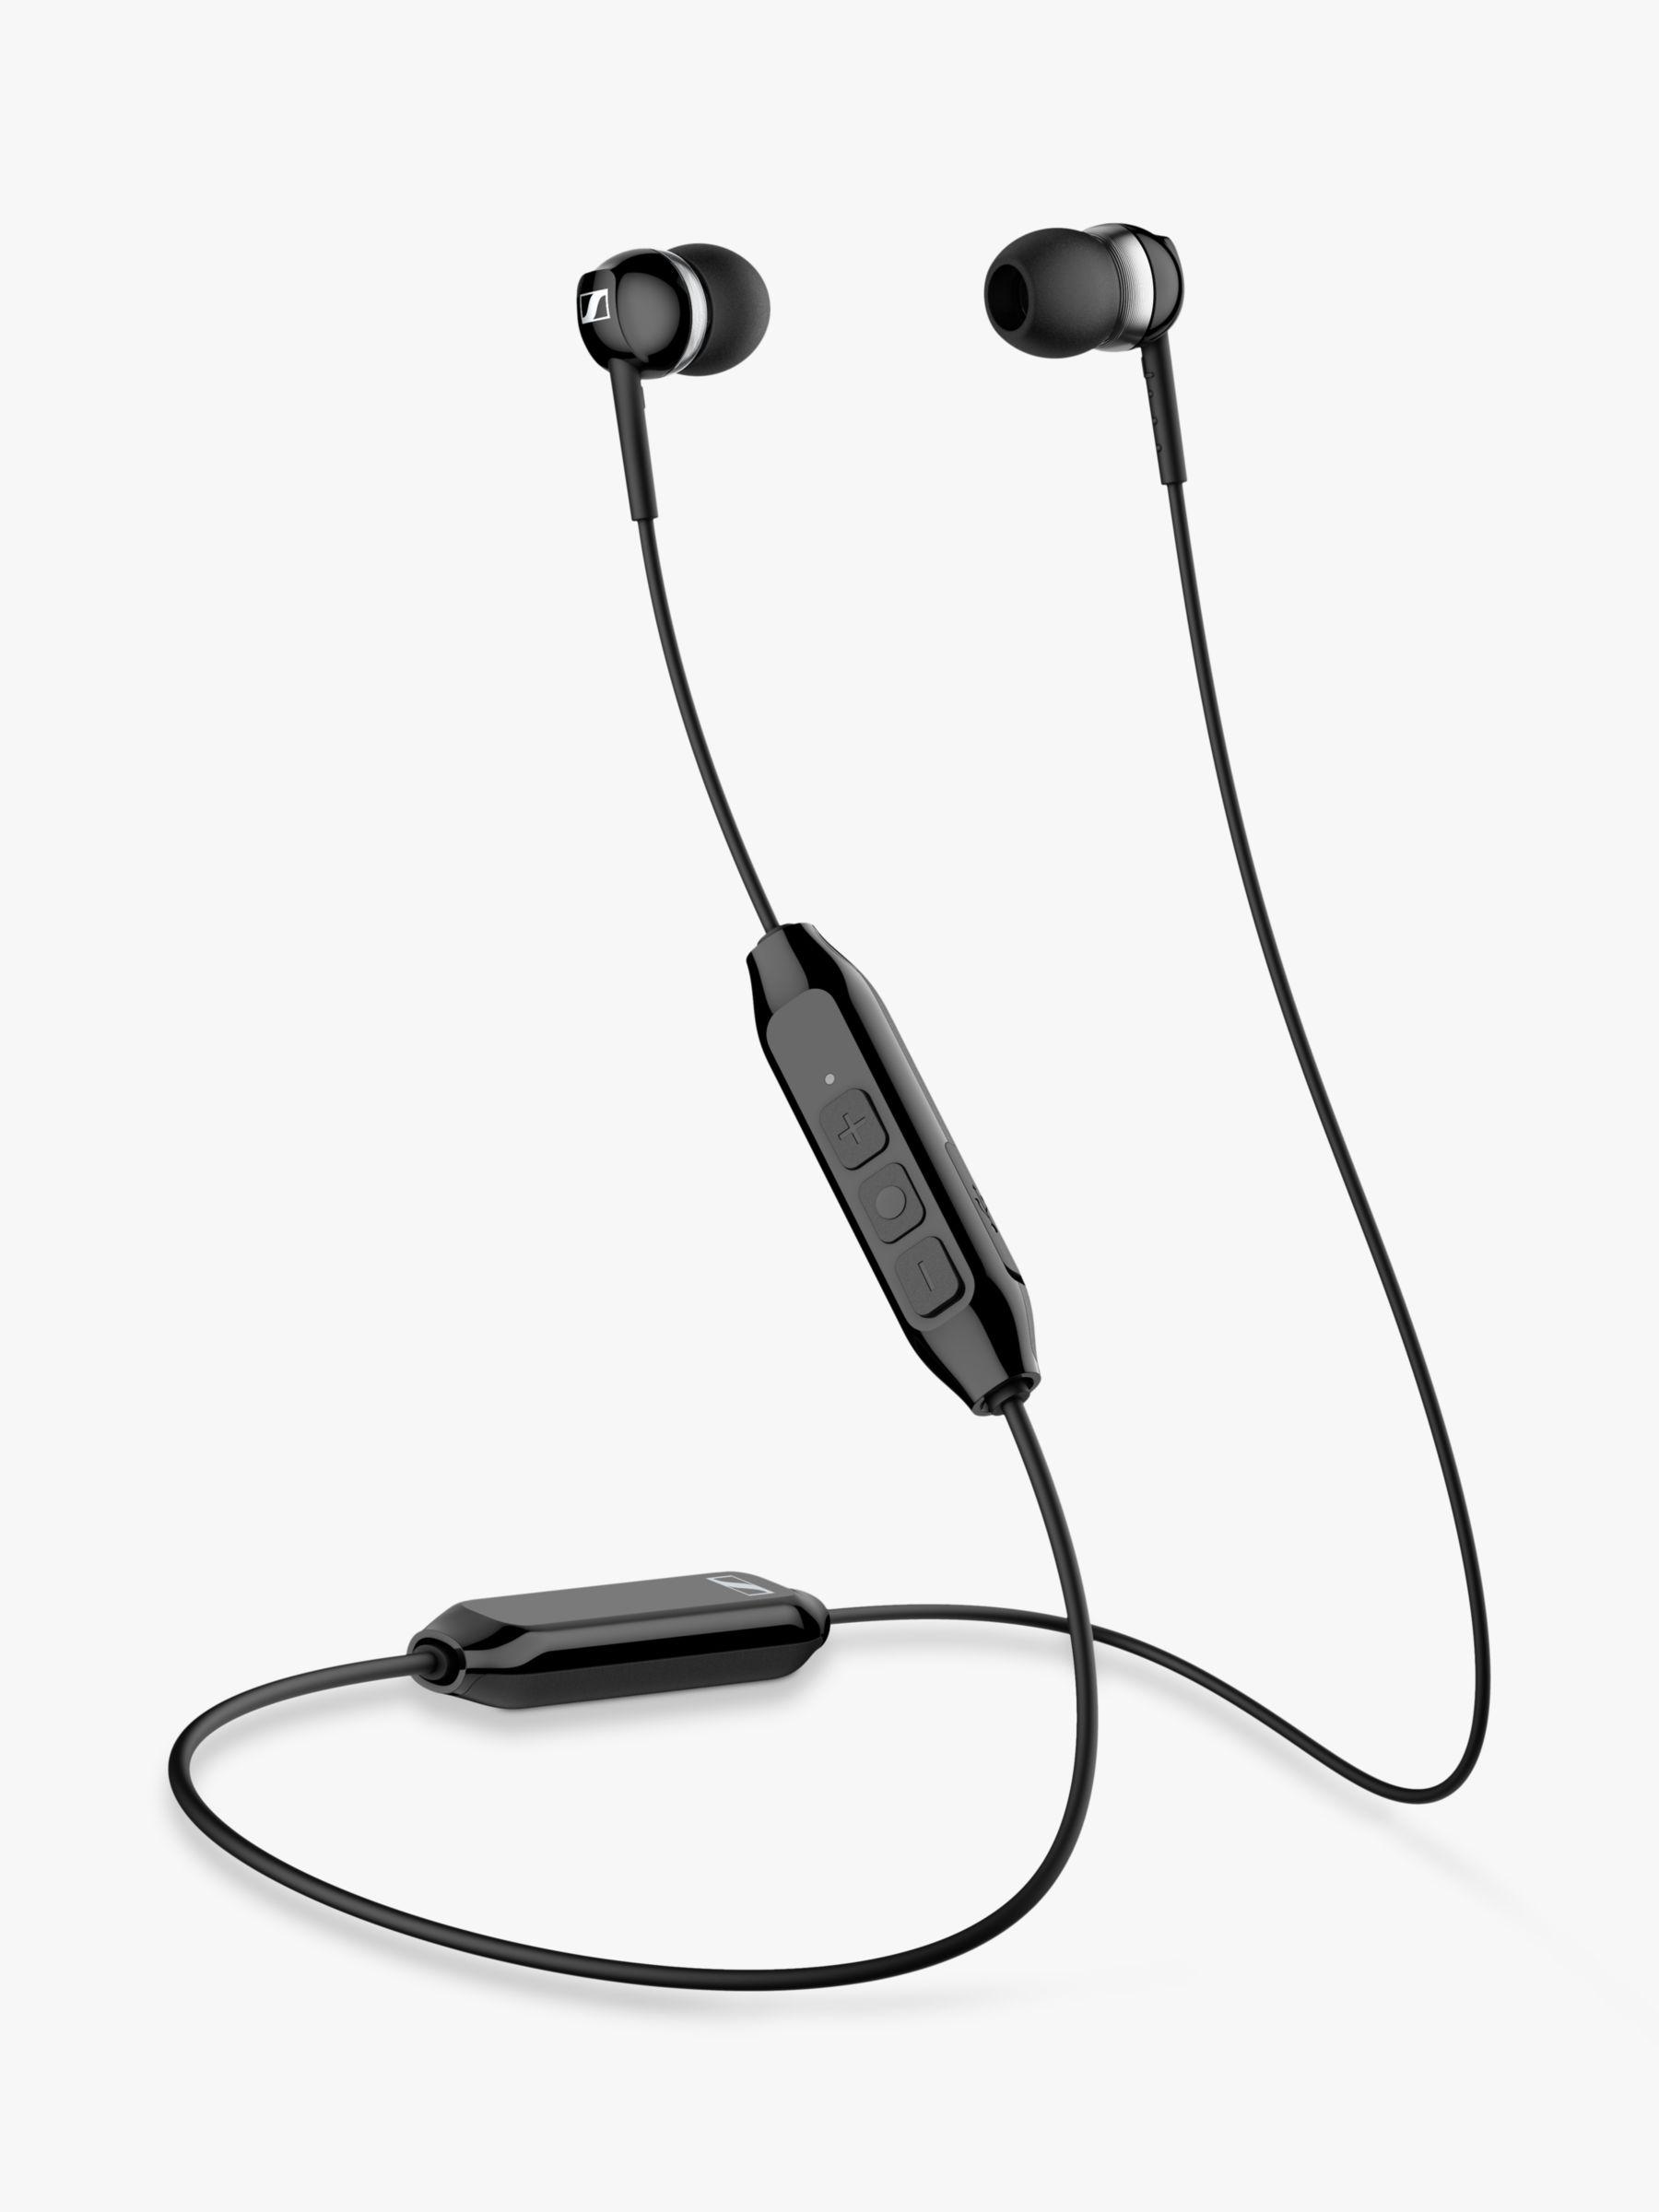 Sennheiser Sennheiser CX 350BT Wireless Bluetooth In-Ear Headphones with Mic/Remote, Black